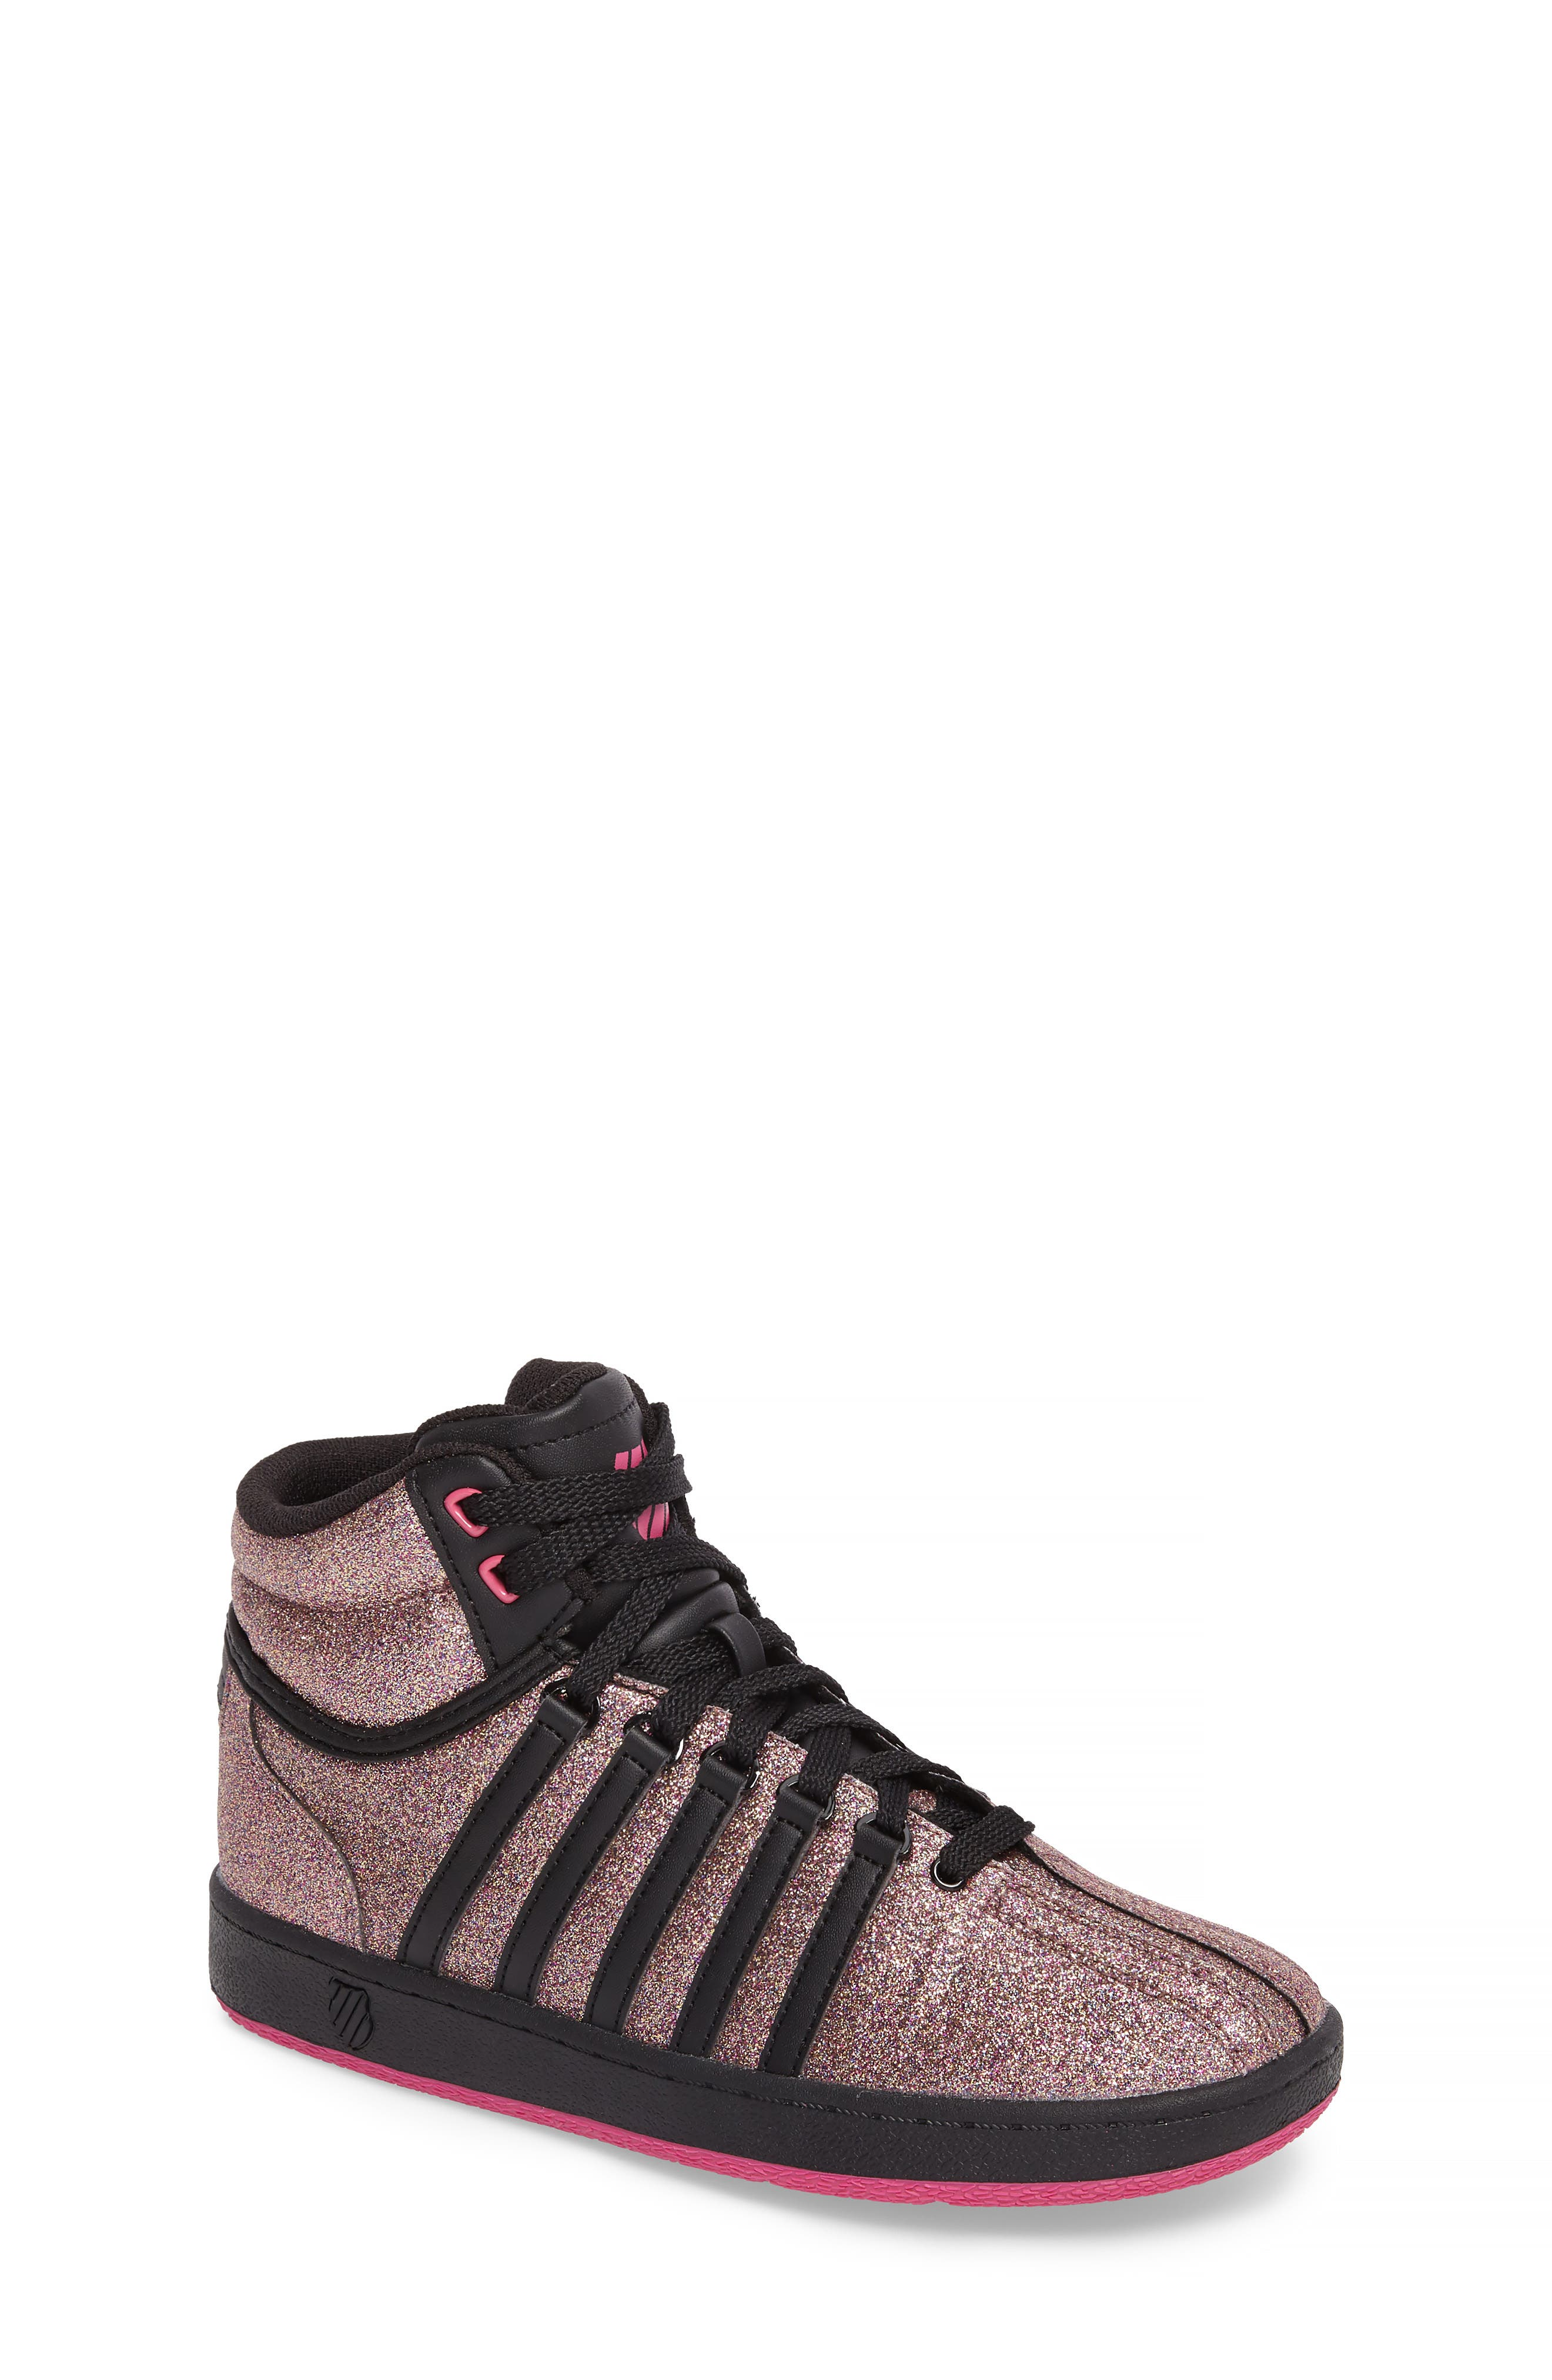 Classic VN Sparkle Mid Sneaker,                         Main,                         color, MULTI SPARKLE